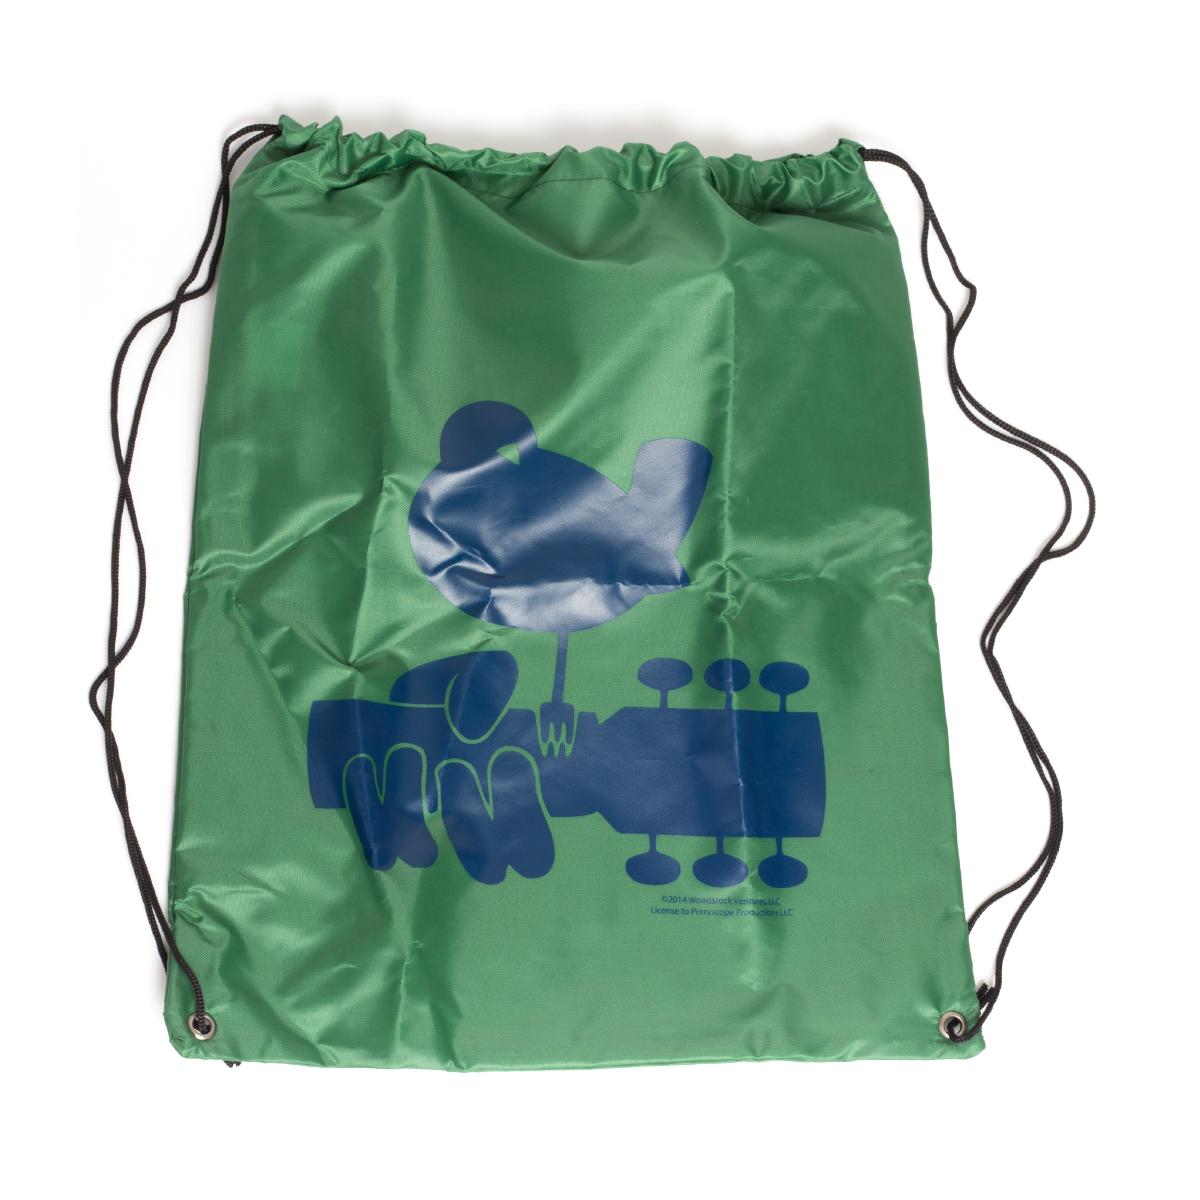 Green Drawstring Dove Bag